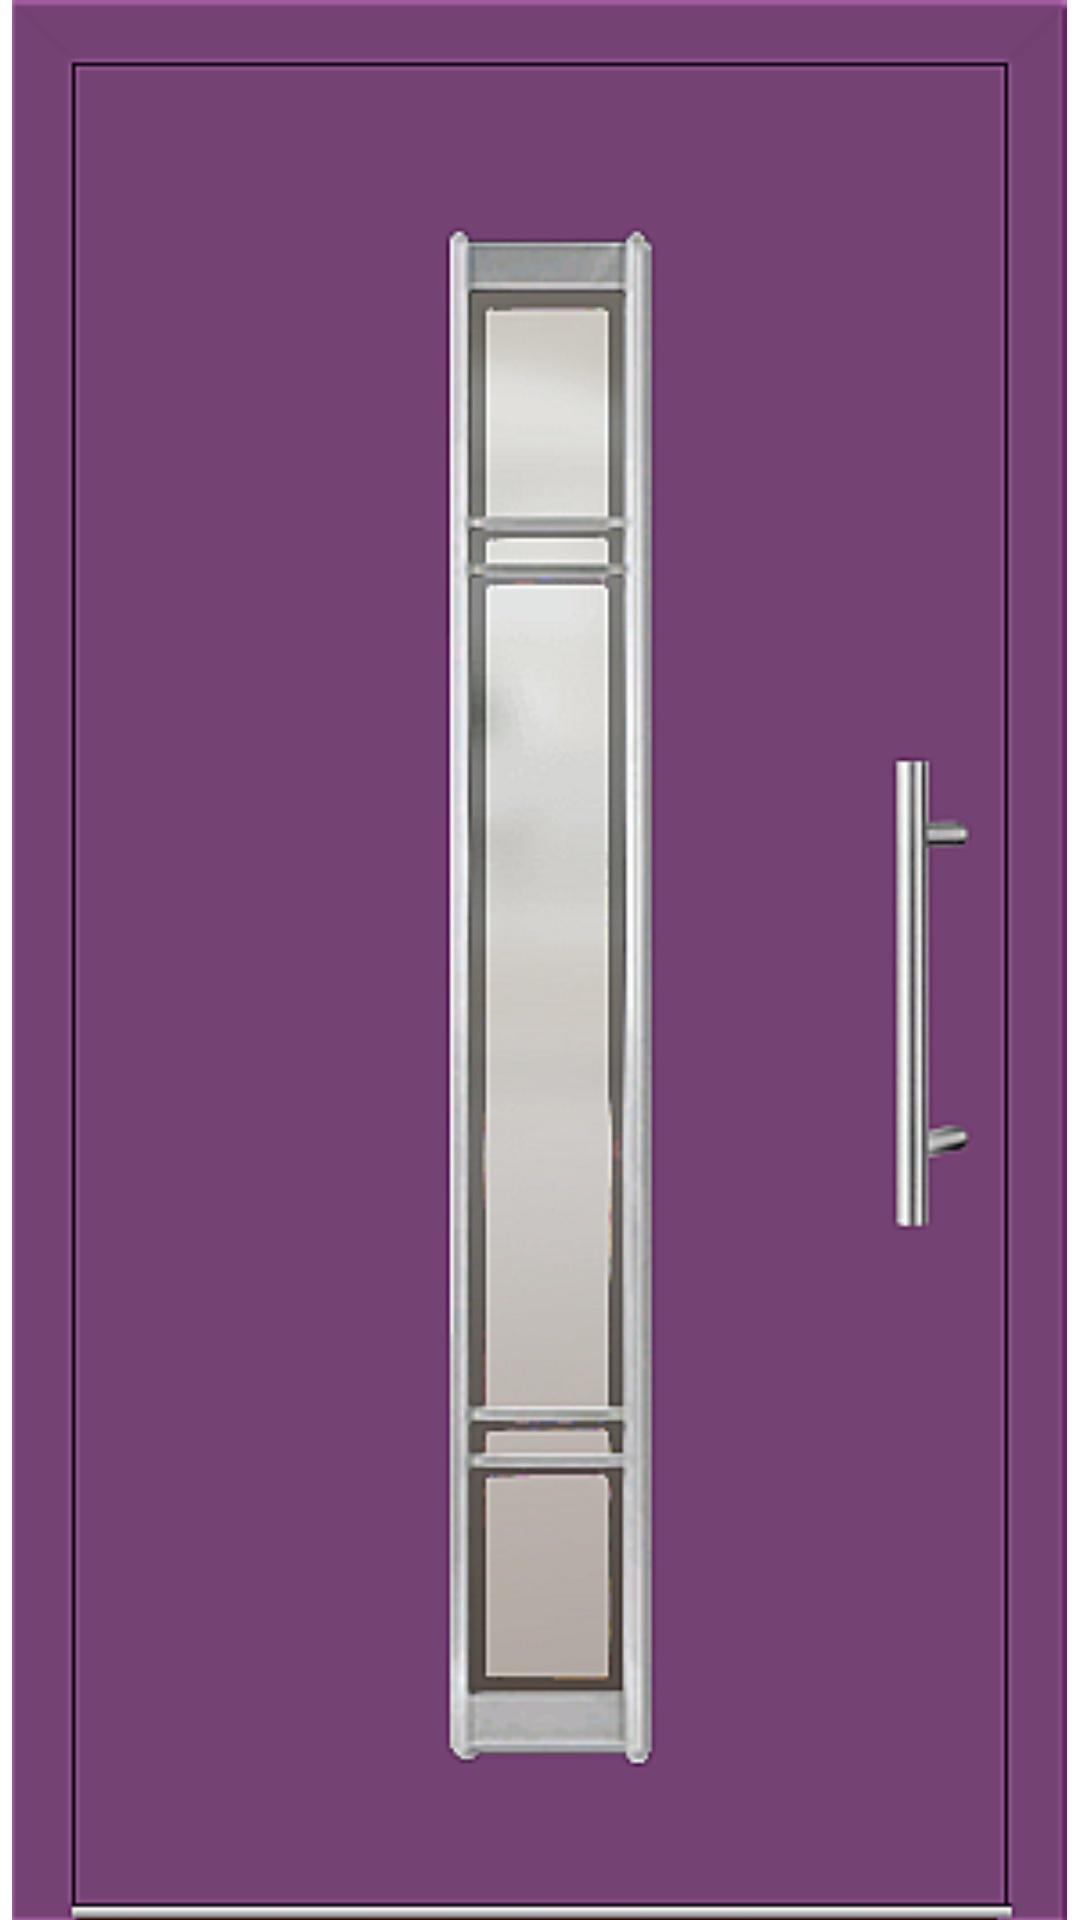 Aluminium Haustür Modell 6977-79 singalviolett